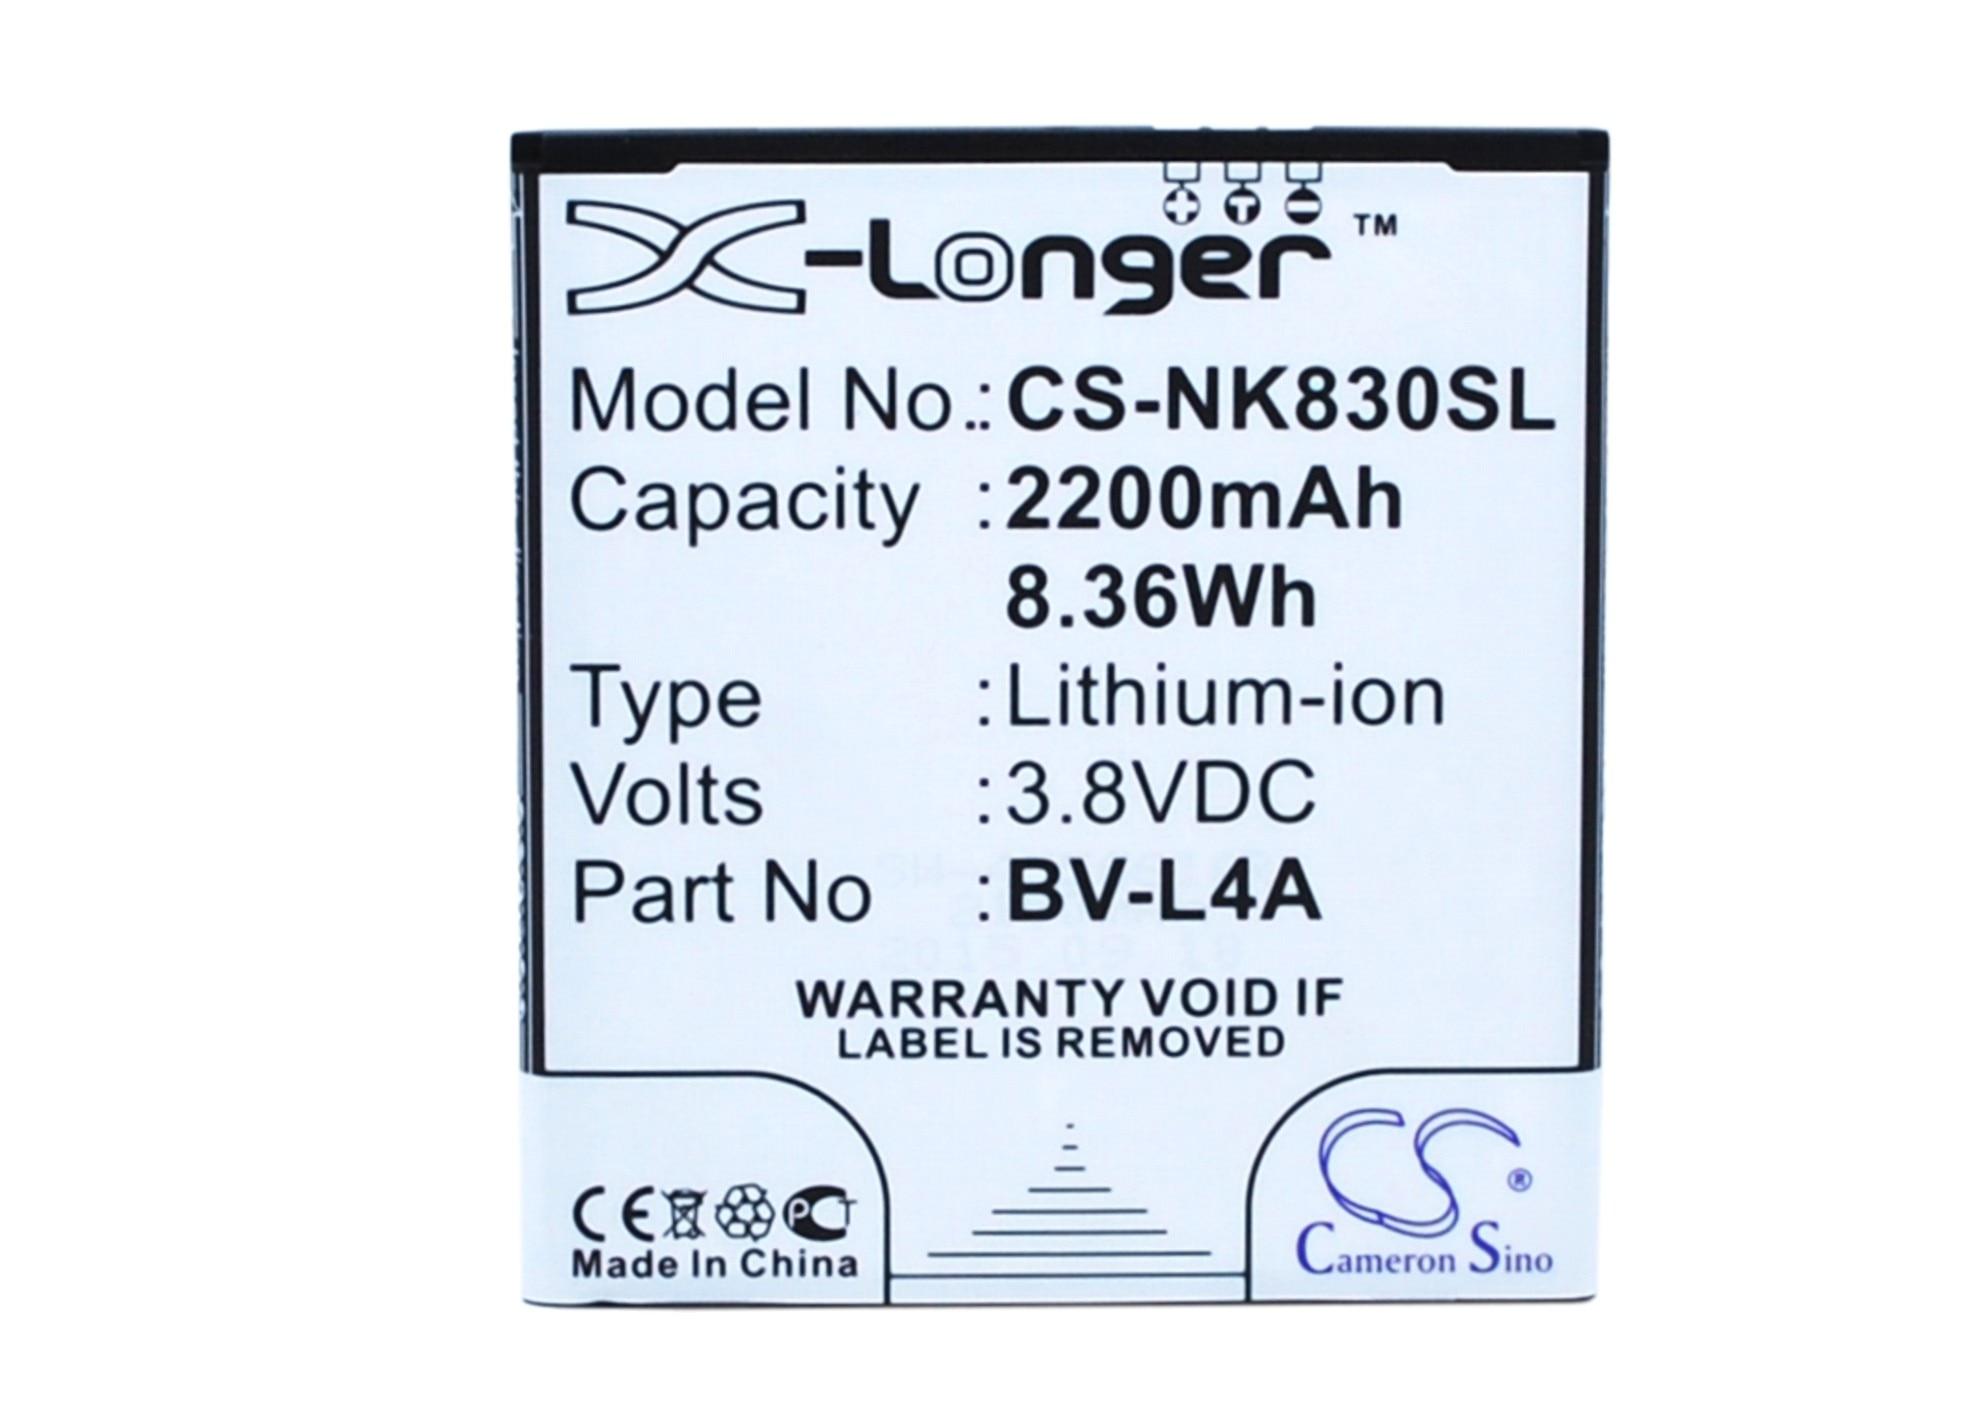 Cameron Sino High Quality 2200mAh Battery BV L4A for Nokia RM 1141  Tesla  For Microsoft Lumia 540  Lumia 540 Dual SIM Lumia 830|Digital Batteries| |  - title=